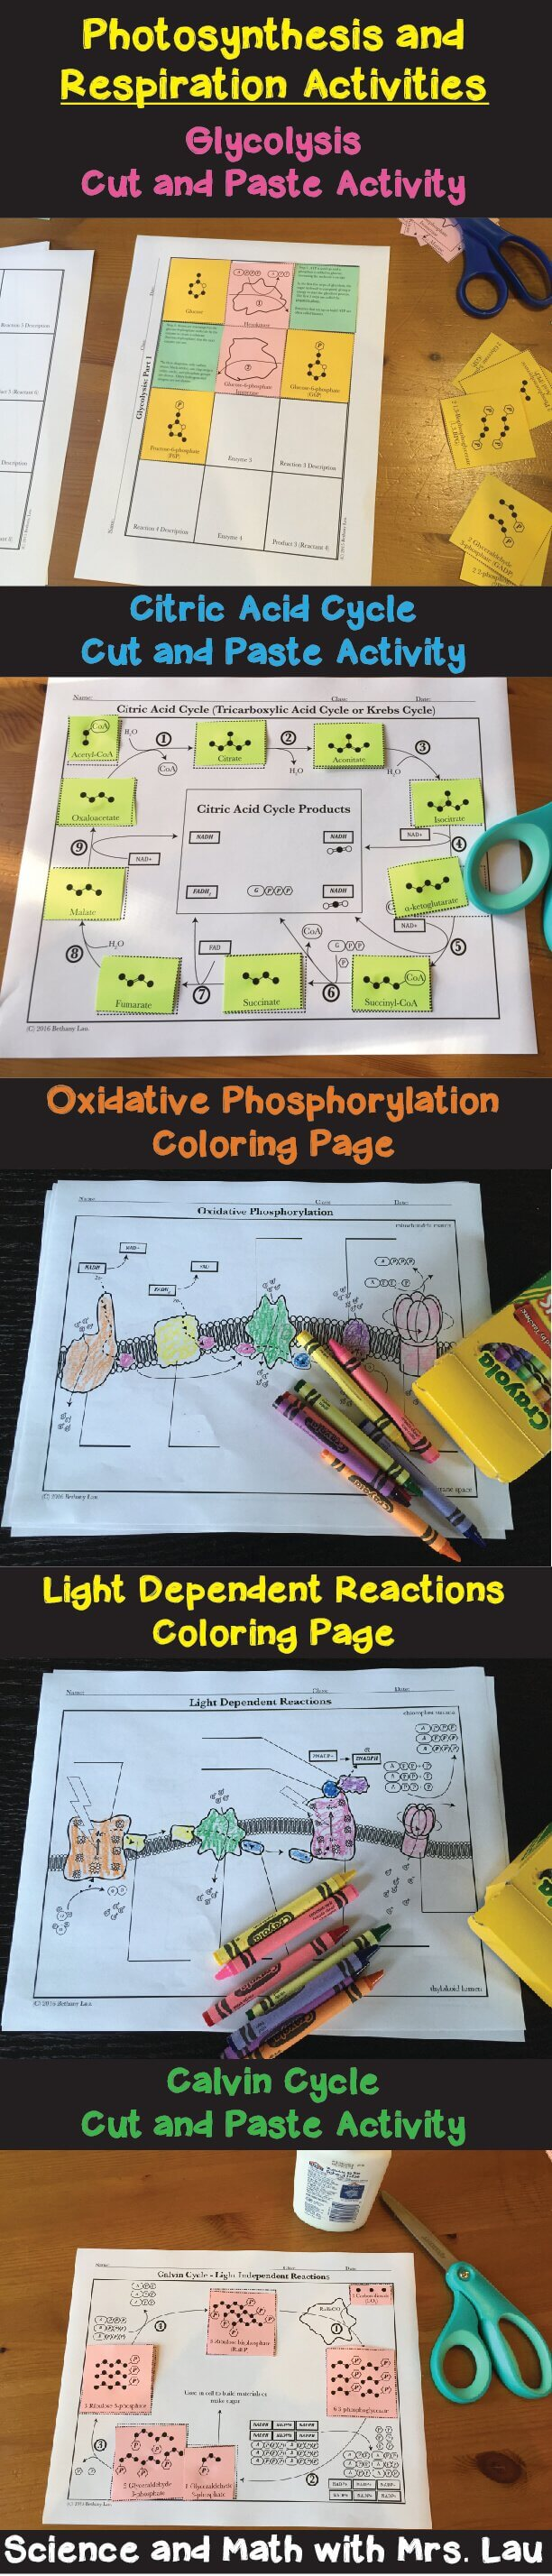 Teaching photosythesis